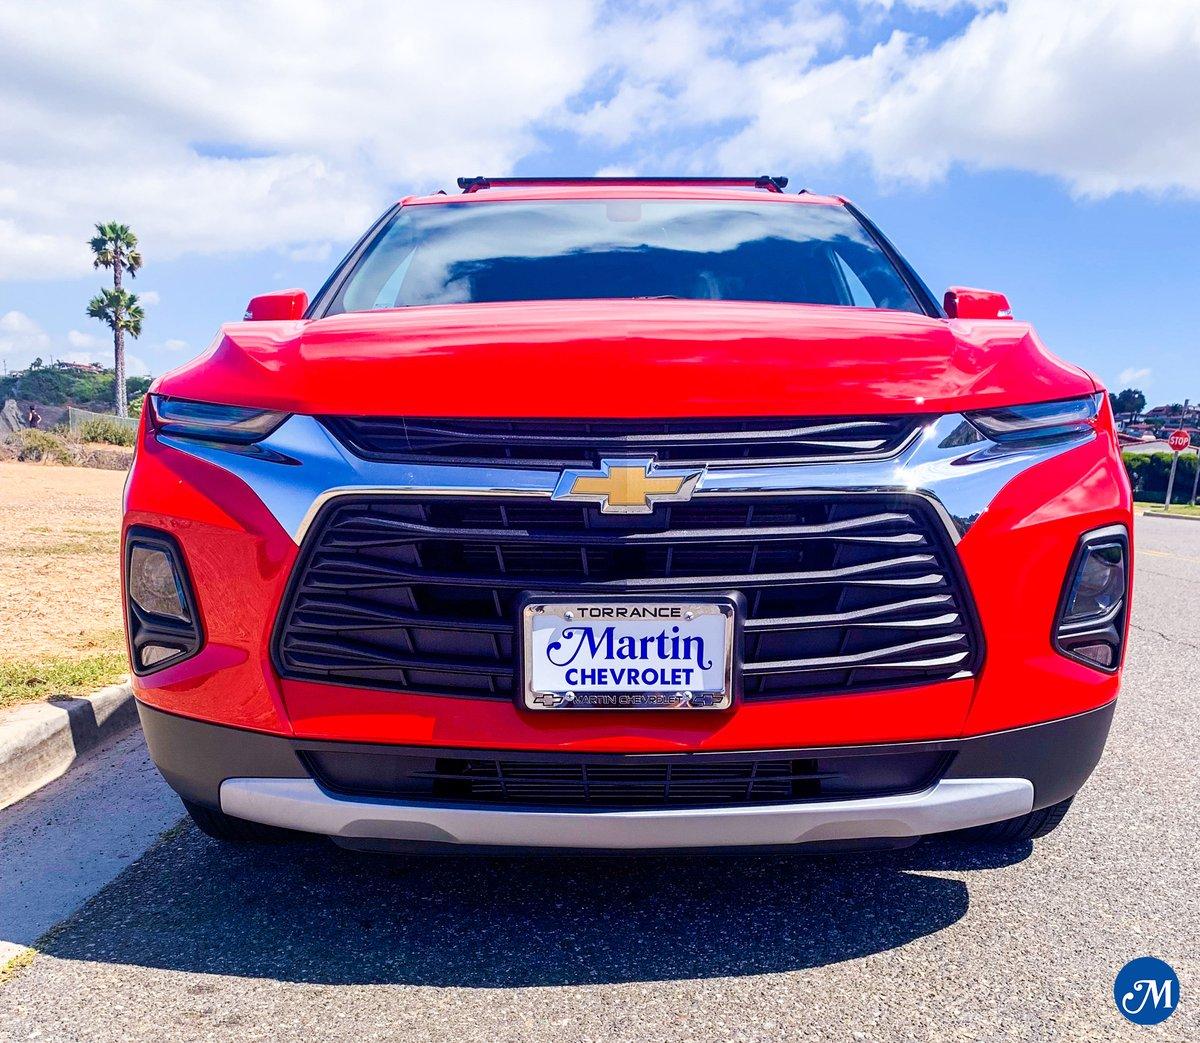 Come see our 4th of July specials here: https://t.co/nfi2TXJMxz  #MartinChevrolet #Chevrolet #FindNewRoads #SouthBay #Torrance #Chevy #ChevyNation #WeAreGM #GeneralMotors #DealershipLife #Blazer #ChevyBlazer #ChevroletBlazer #FourthOfJuly #4thOfJuly https://t.co/2TI7jZT5Ll